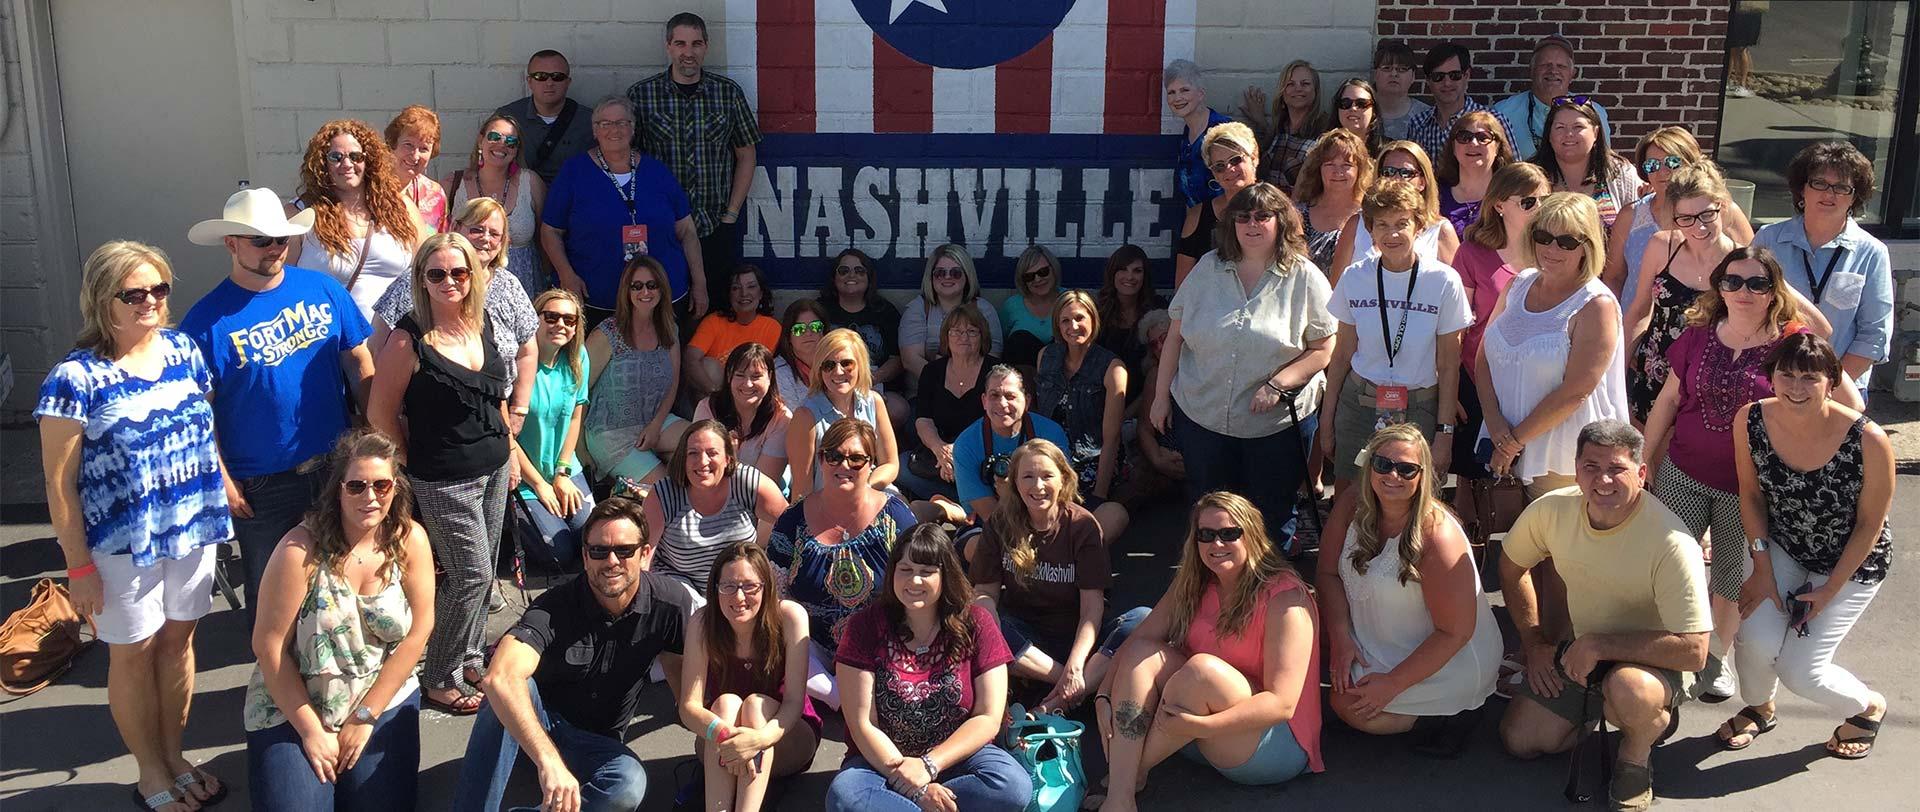 Nashville Bus Tour | Charles Esten